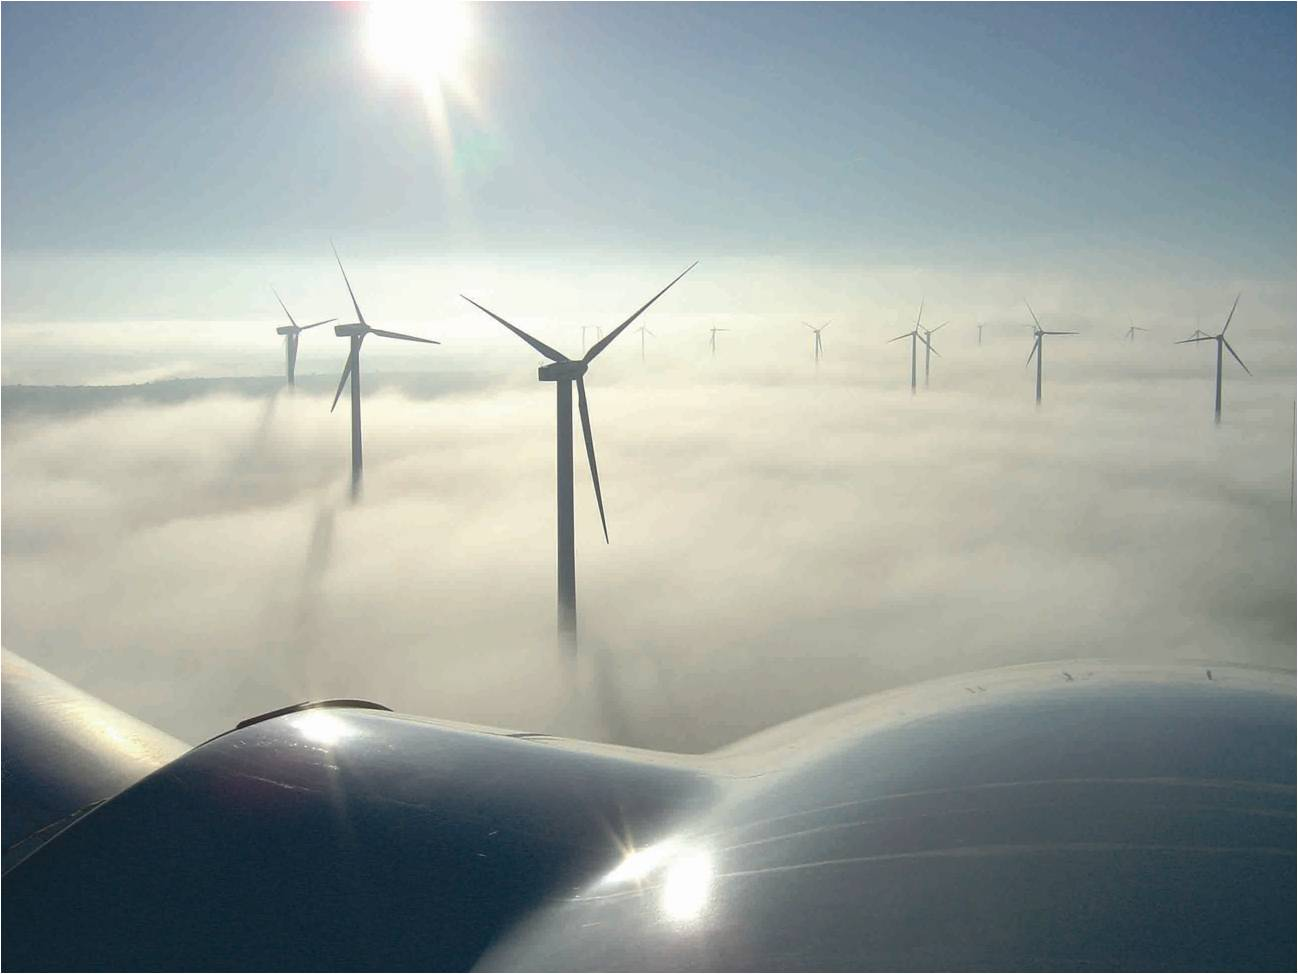 Gamesa vende un parque eólico en Polonia con 15 aerogeneradores G90